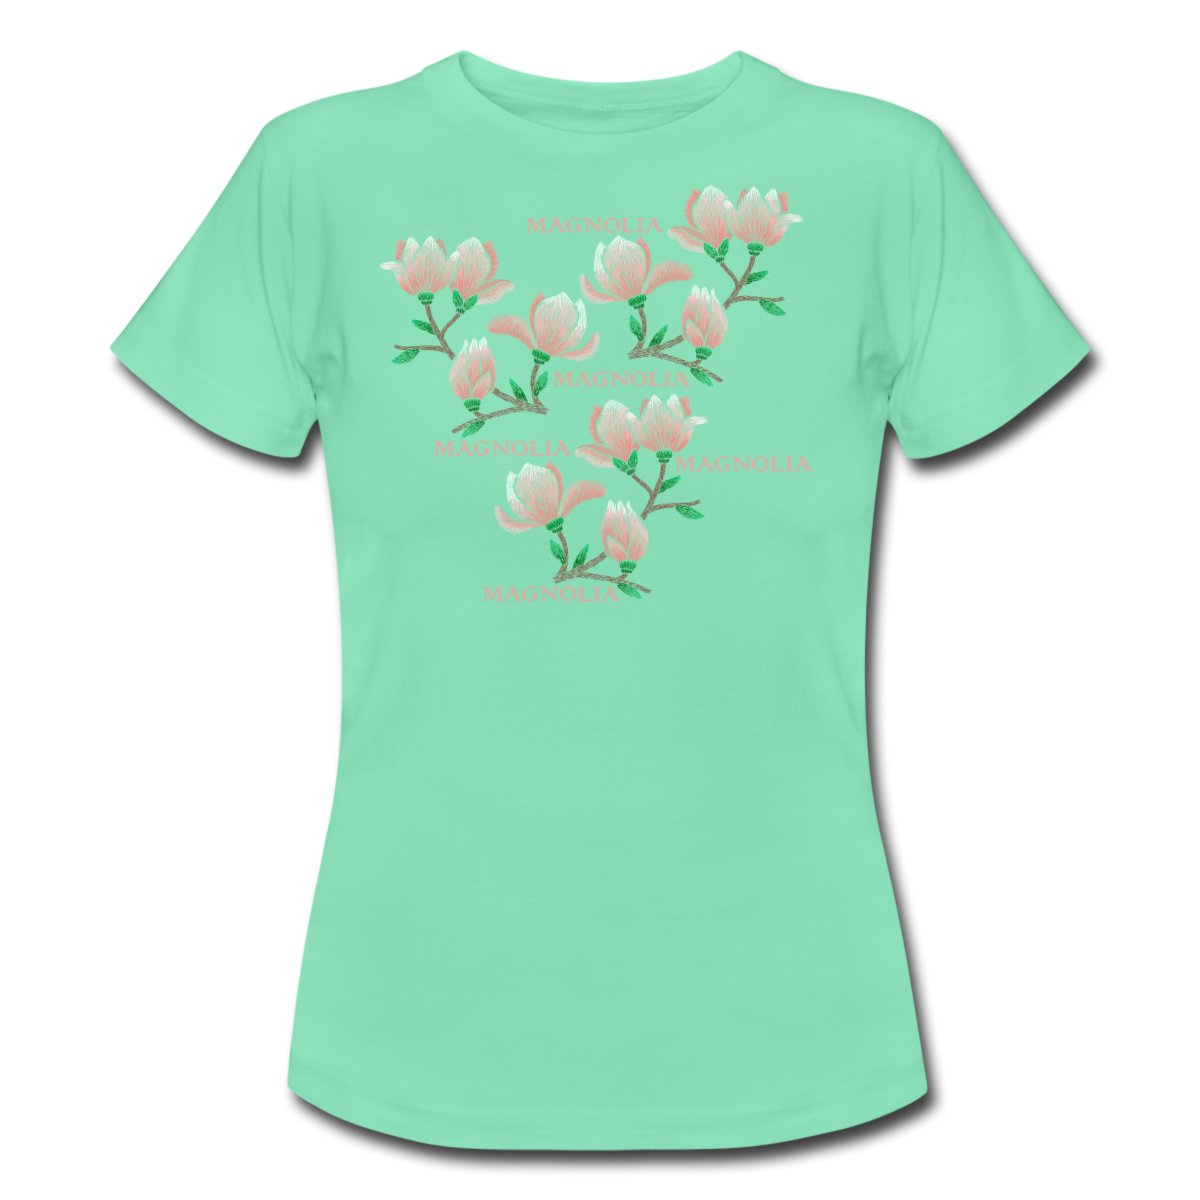 magnolia-t-shirt-dam-mg.jpg